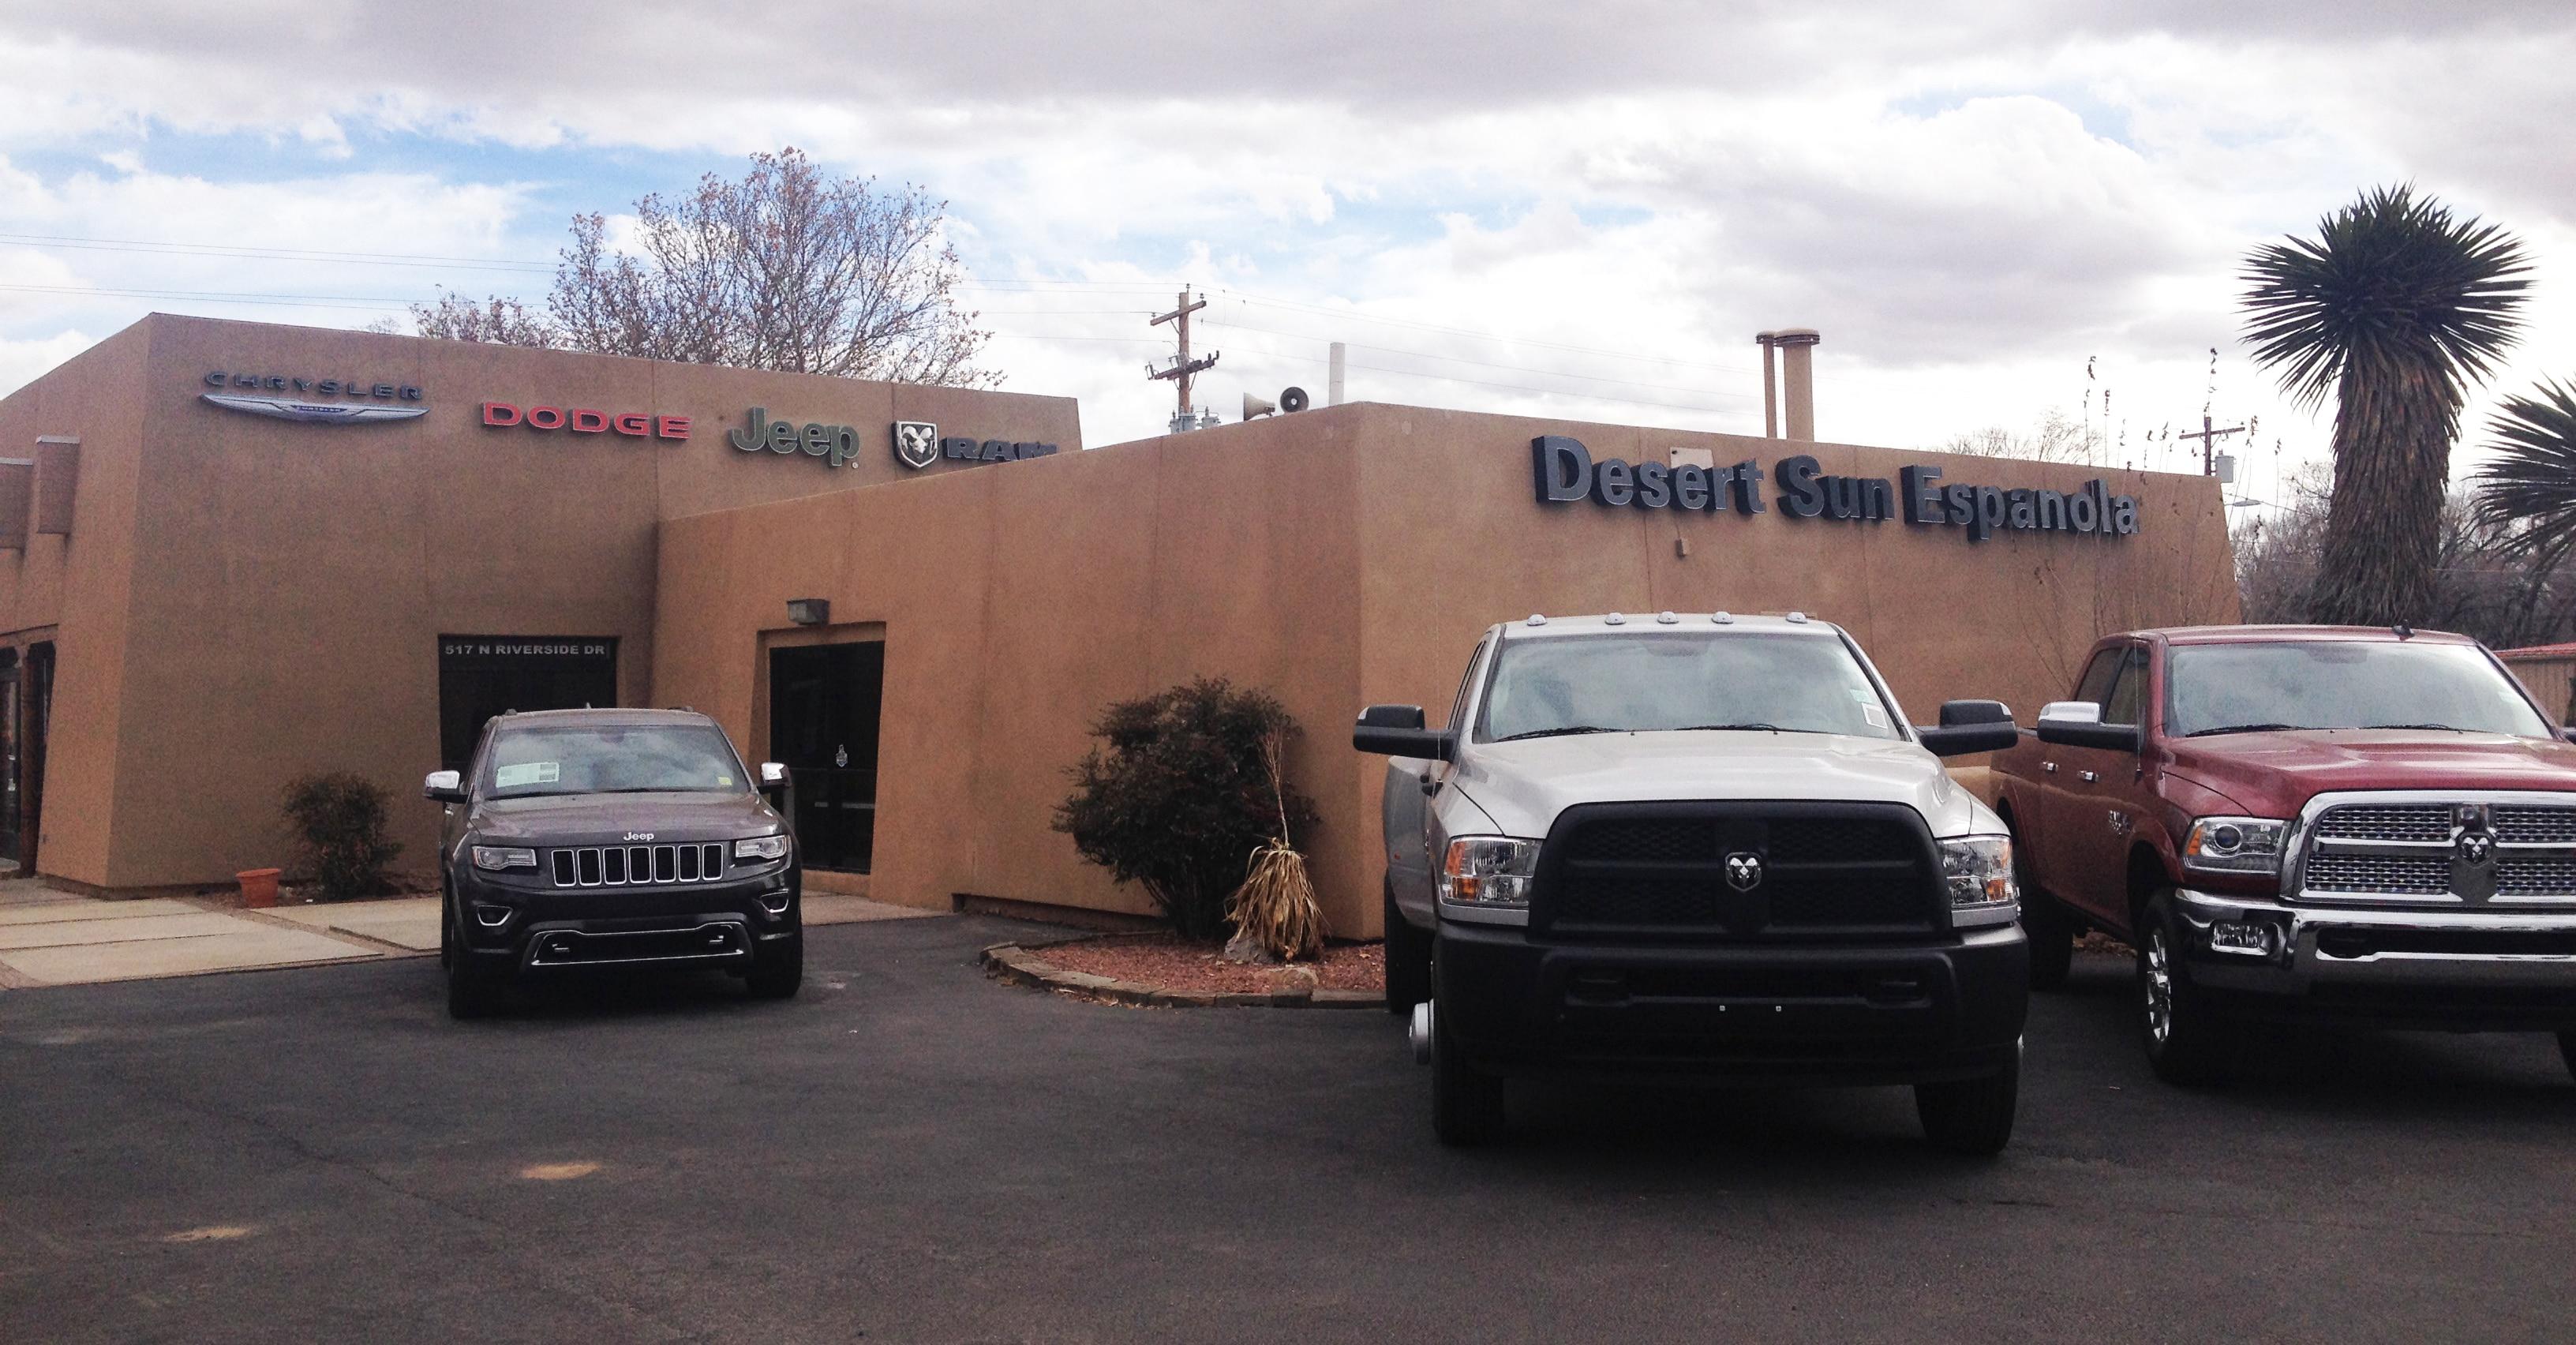 New Mexico Motor Vehicle Division Albuquerque Nm >> Espanola Motor Vehicle Department - impremedia.net